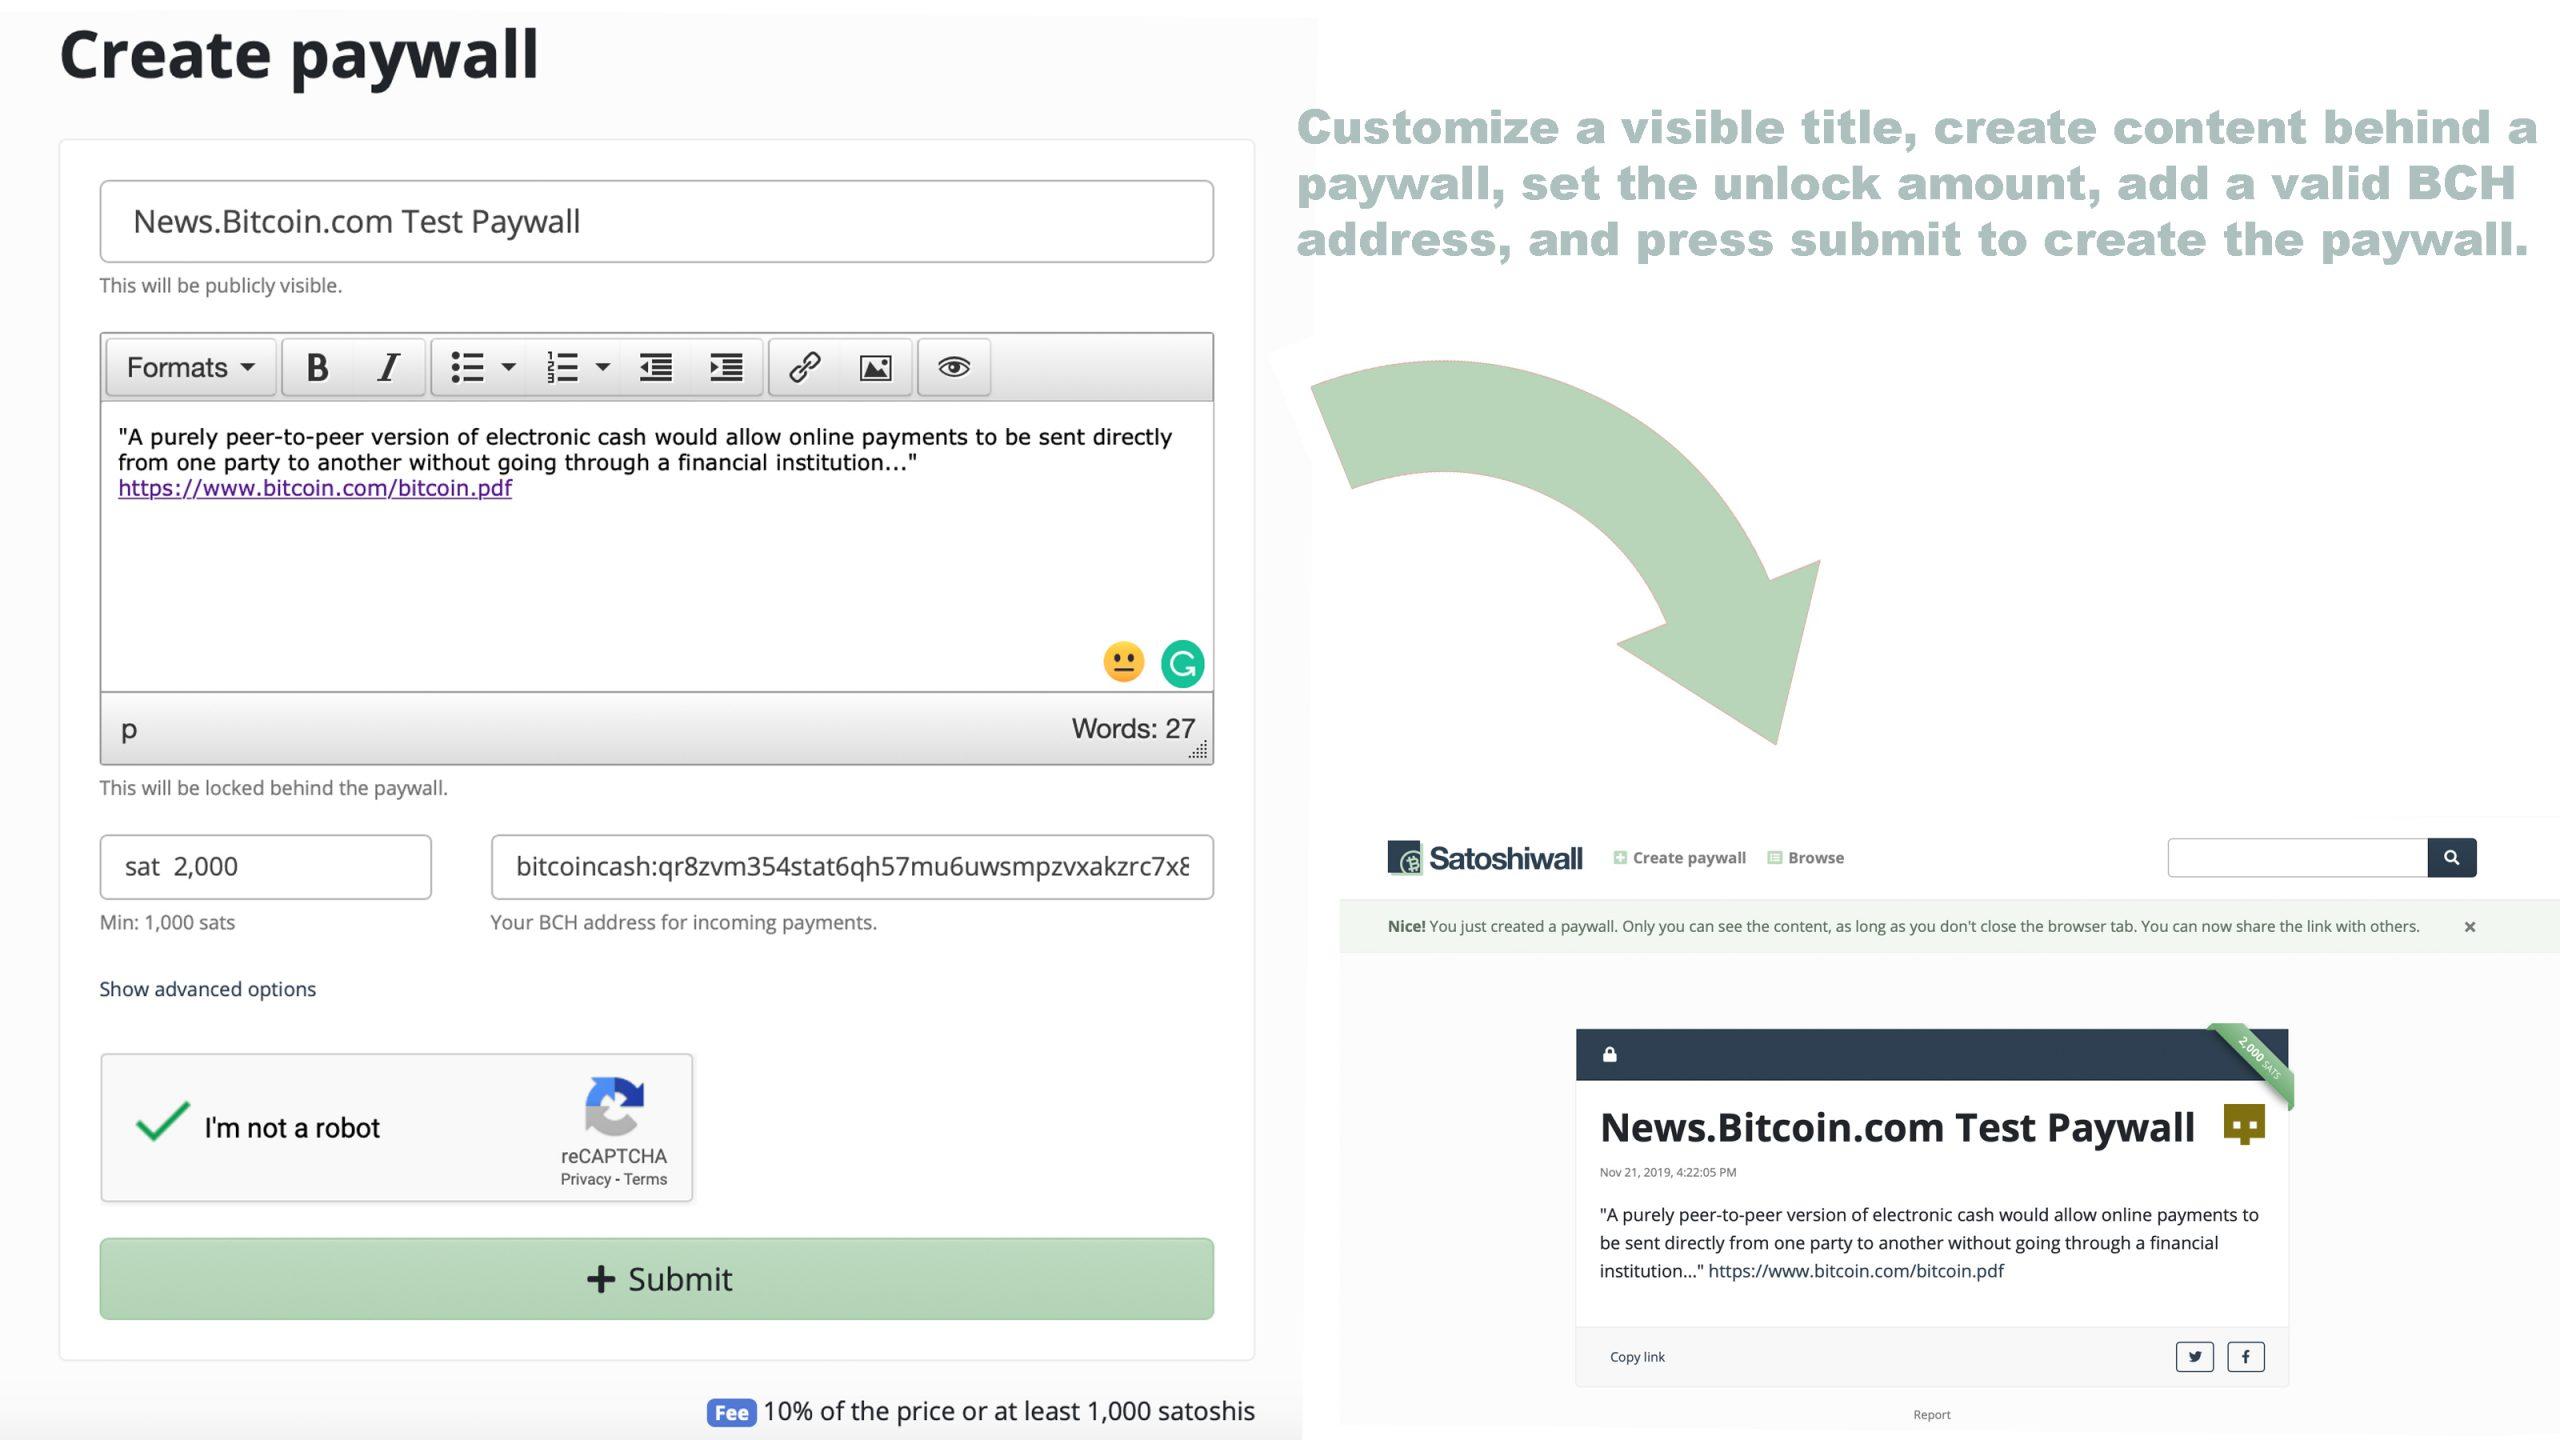 "El desarrollador lanza el servicio Paywall con tecnología de BCH ""width ="" 2560 ""height ="" 1440 ""srcset = ""https://blackswanfinances.com/wp-content/uploads/2019/11/paywall-scaled.jpg 2560w, https://news.bitcoin.com/wp-content/uploads/2019/11/paywall -300x169.jpg 300w, https://news.bitcoin.com/wp-content/uploads/2019/11/paywall-1024x576.jpg 1024w, https://news.bitcoin.com/wp-content/uploads/2019 /11/paywall-768x432.jpg 768w, https://news.bitcoin.com/wp-content/uploads/2019/11/paywall-1536x864.jpg 1536w, https://news.bitcoin.com/wp-content /uploads/2019/11/paywall-2048x1152.jpg 2048w, https://news.bitcoin.com/wp-content/uploads/2019/11/paywall-696x392.jpg 696w, https://news.bitcoin.com /wp-content/uploads/2019/11/paywall-1392x783.jpg 1392w, https://news.bitcoin.com/wp-content/uploads/2019/11/paywall-1068x601.jpg 1068w, https: // noticias .bitcoin.com / wp-content / uploads / 2019/11 / paywall-747x420.jpg 747w , https://news.bitcoin.com/wp-content/uploads/2019/11/paywall-1920x1080.jpg 1920w ""tamaños ="" (ancho máximo: 2560px) 100vw, 2560px"